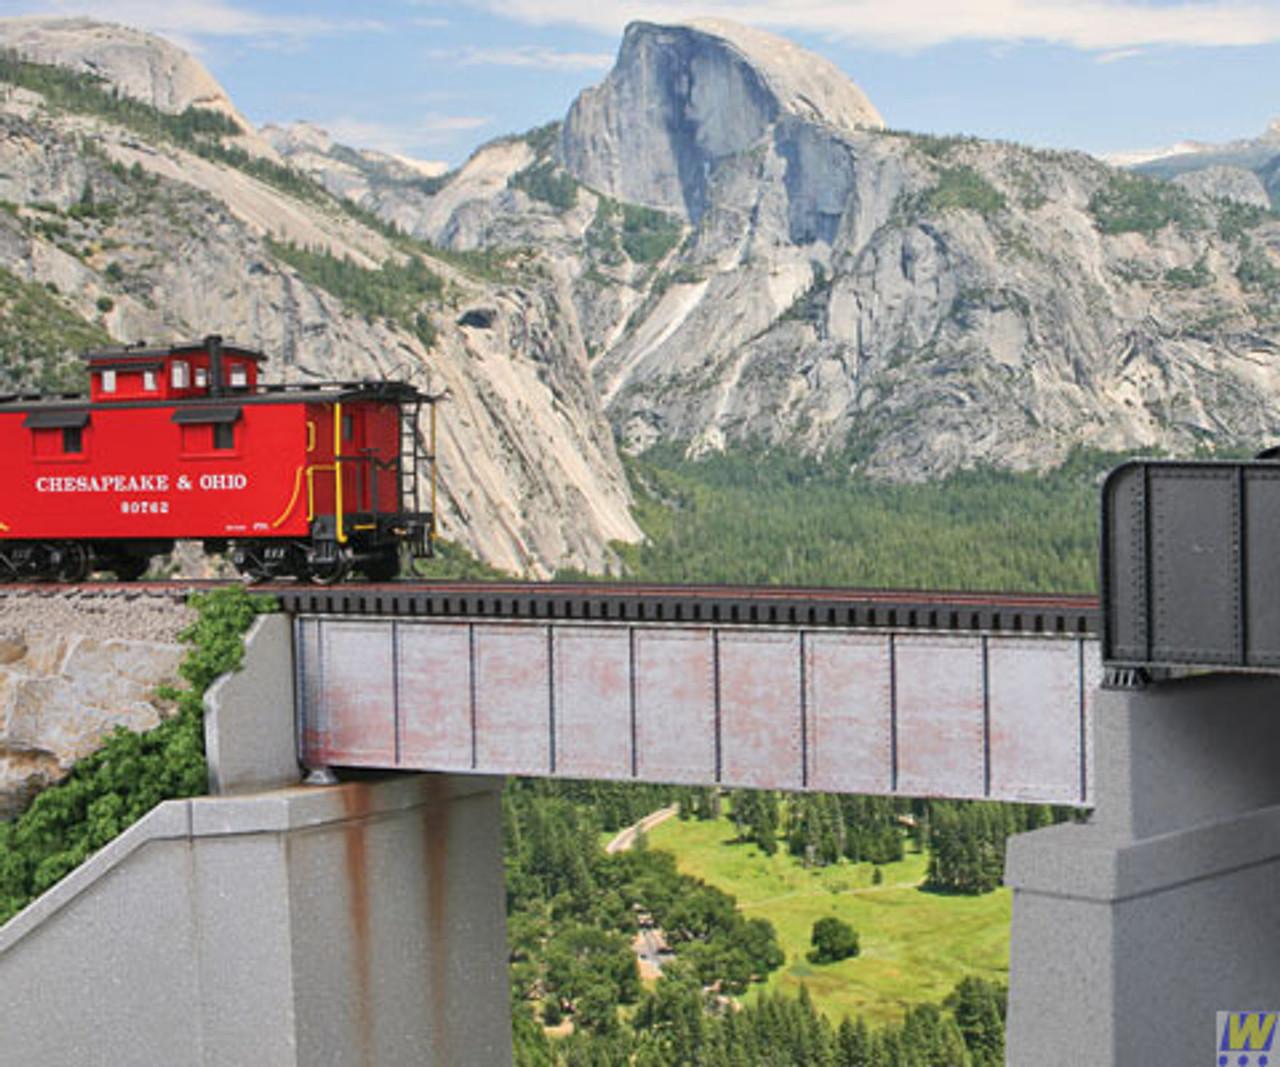 Walthers 933-4506 50' Single-Track Railroad Deck Girder Bridge - Kit  (Scale=HO) Cornerstone Part#933-4506